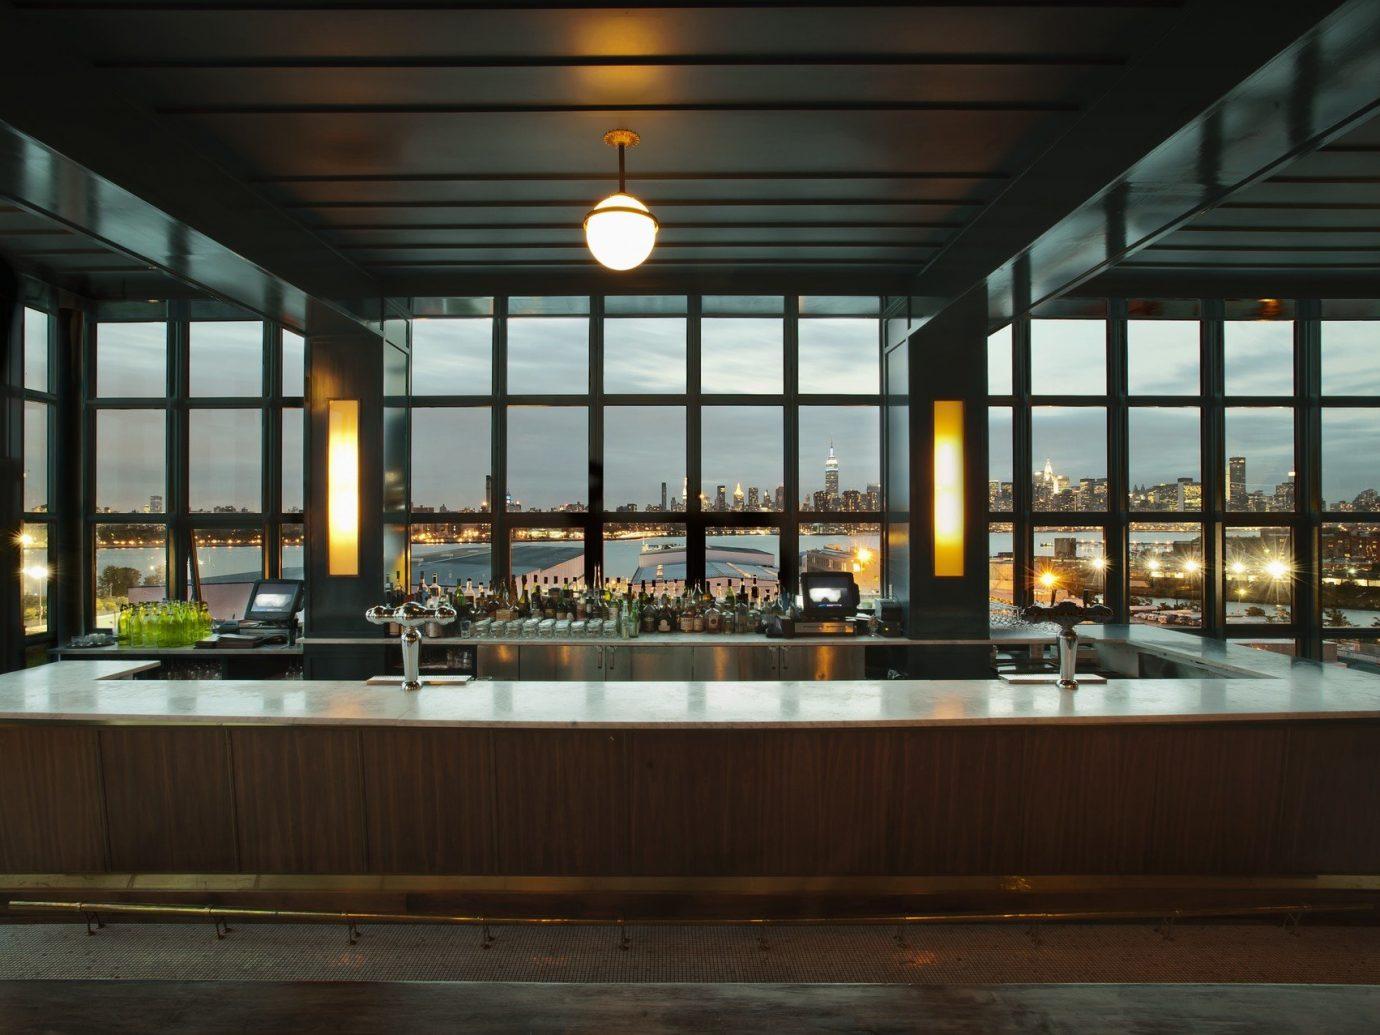 Food + Drink Hotels indoor ceiling floor window building Lobby interior design estate